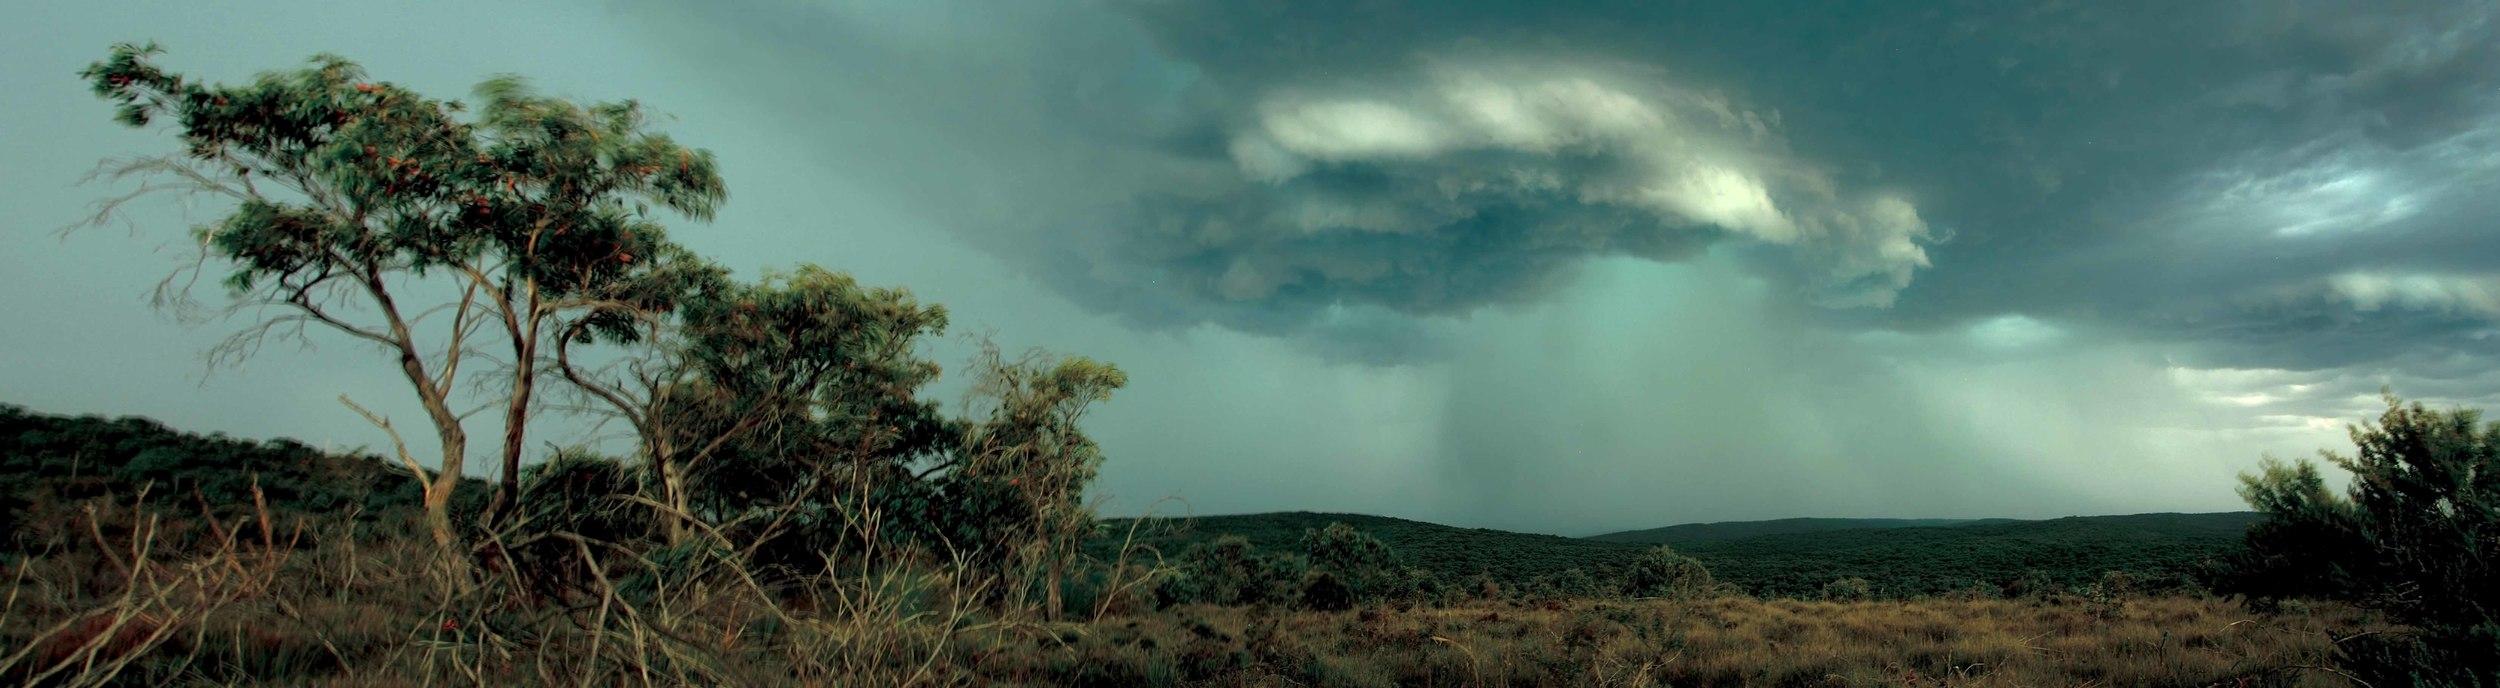 otway_storm_brooding_mood_sm.jpg